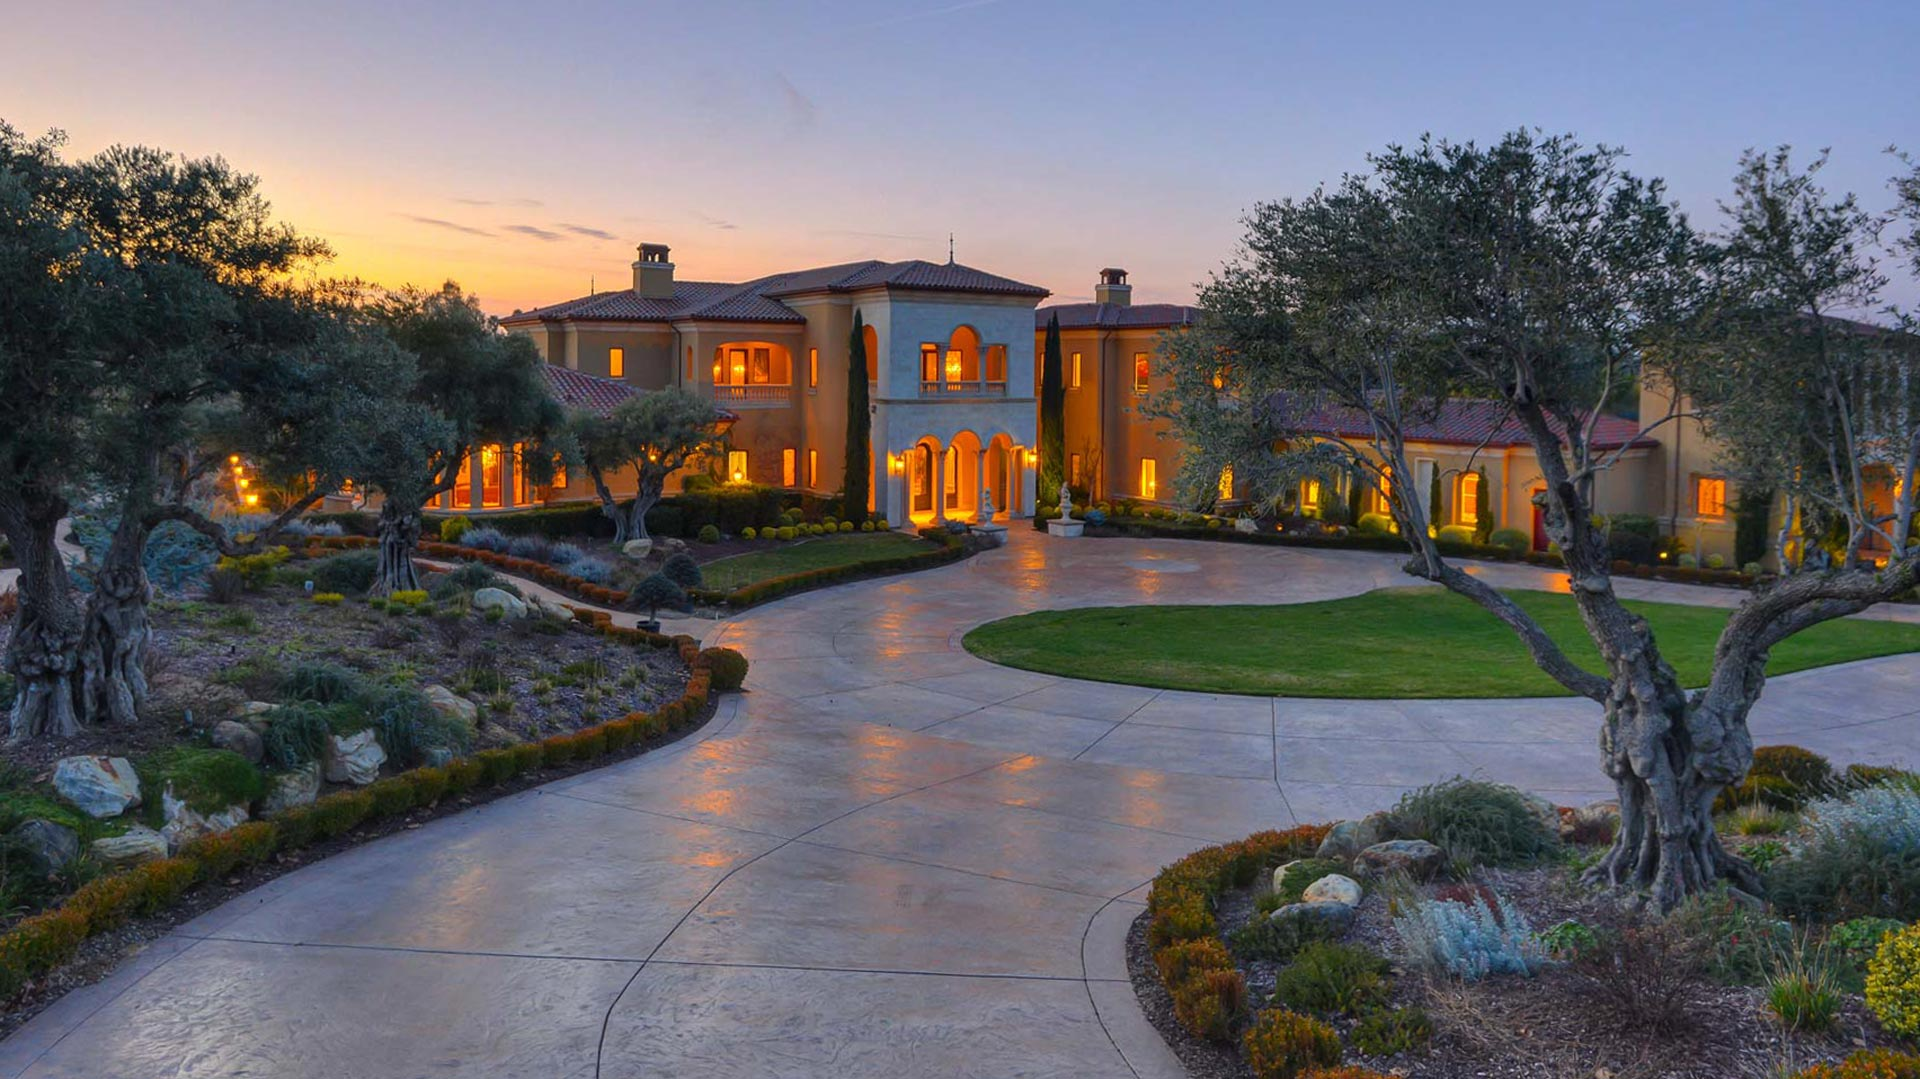 granite bay home and driveway at sunset